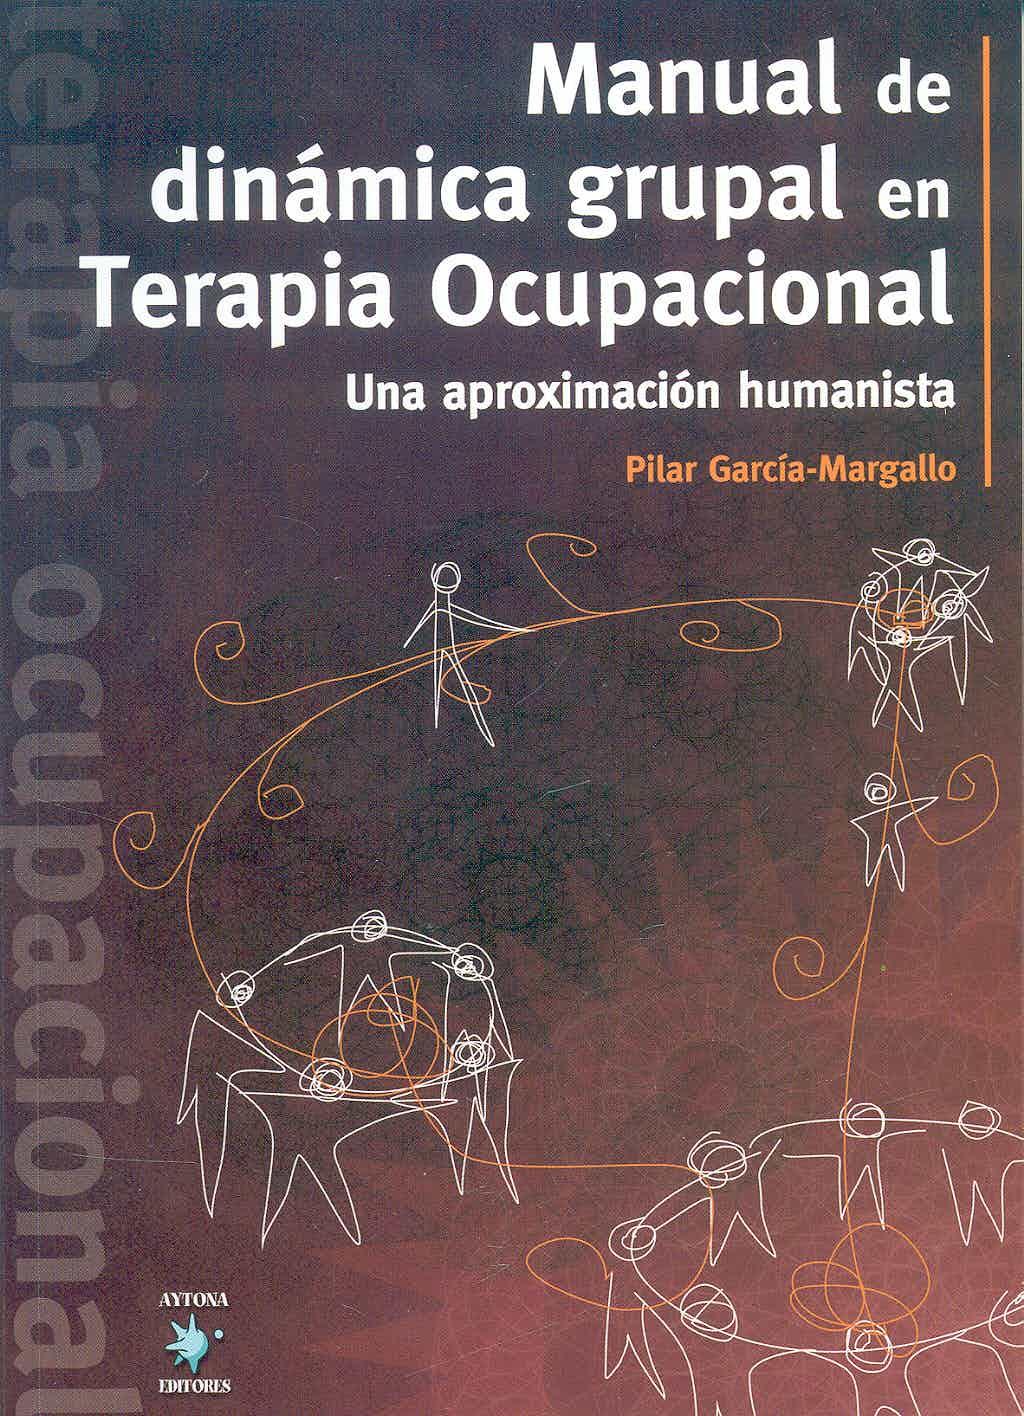 Libros Terapia Ocupacional manual de dinamica grupal en terapia tcupacional